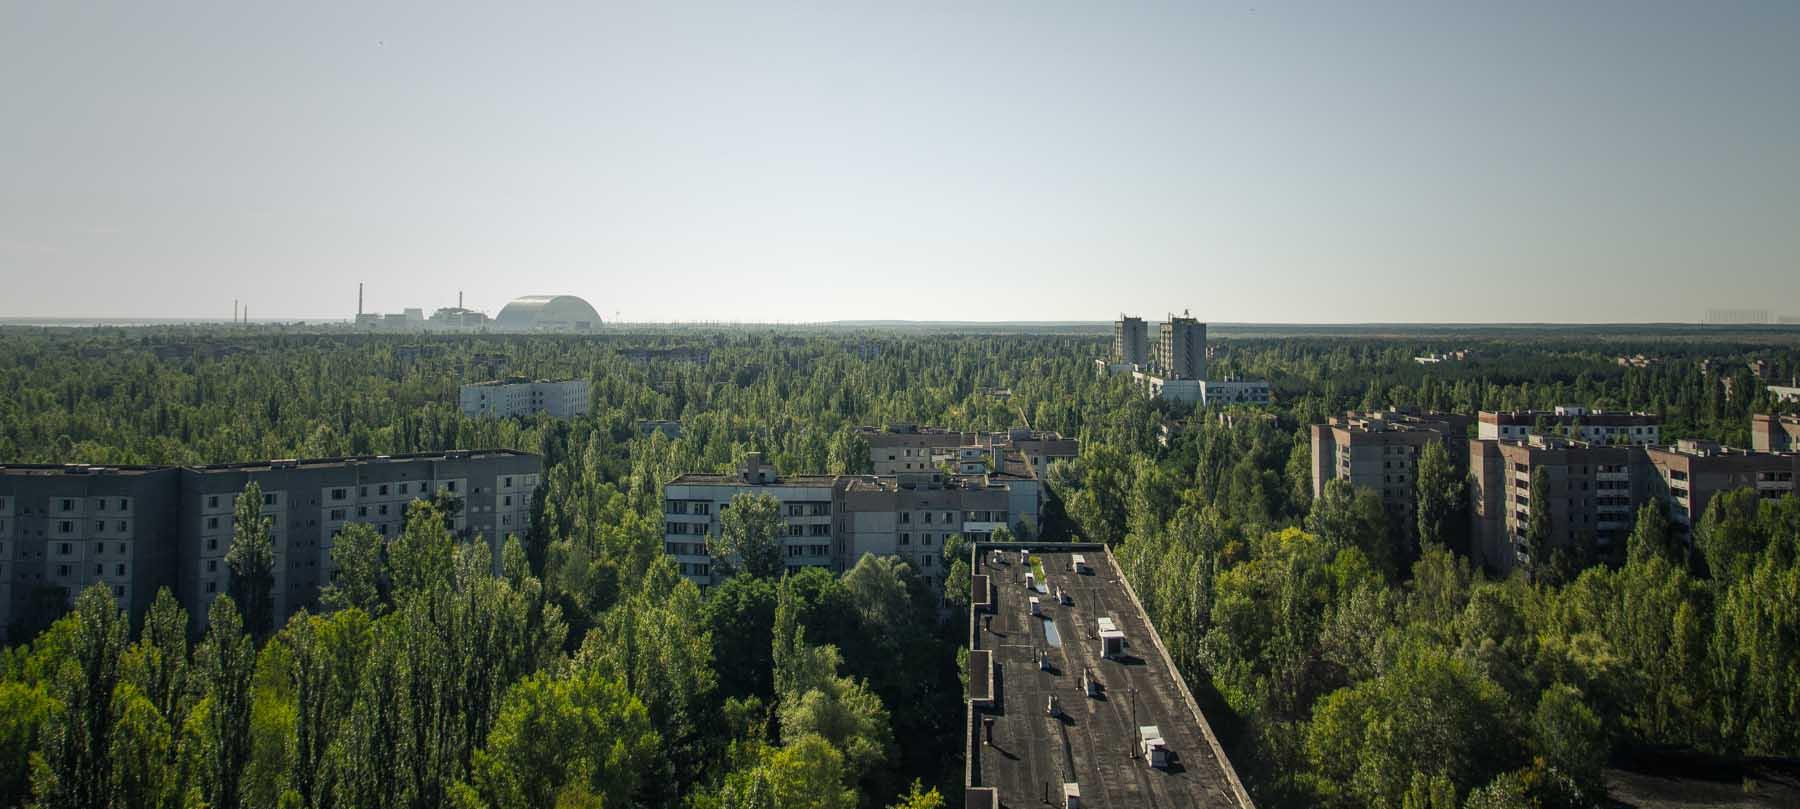 pripyat chernobyl ghost town città fantasma